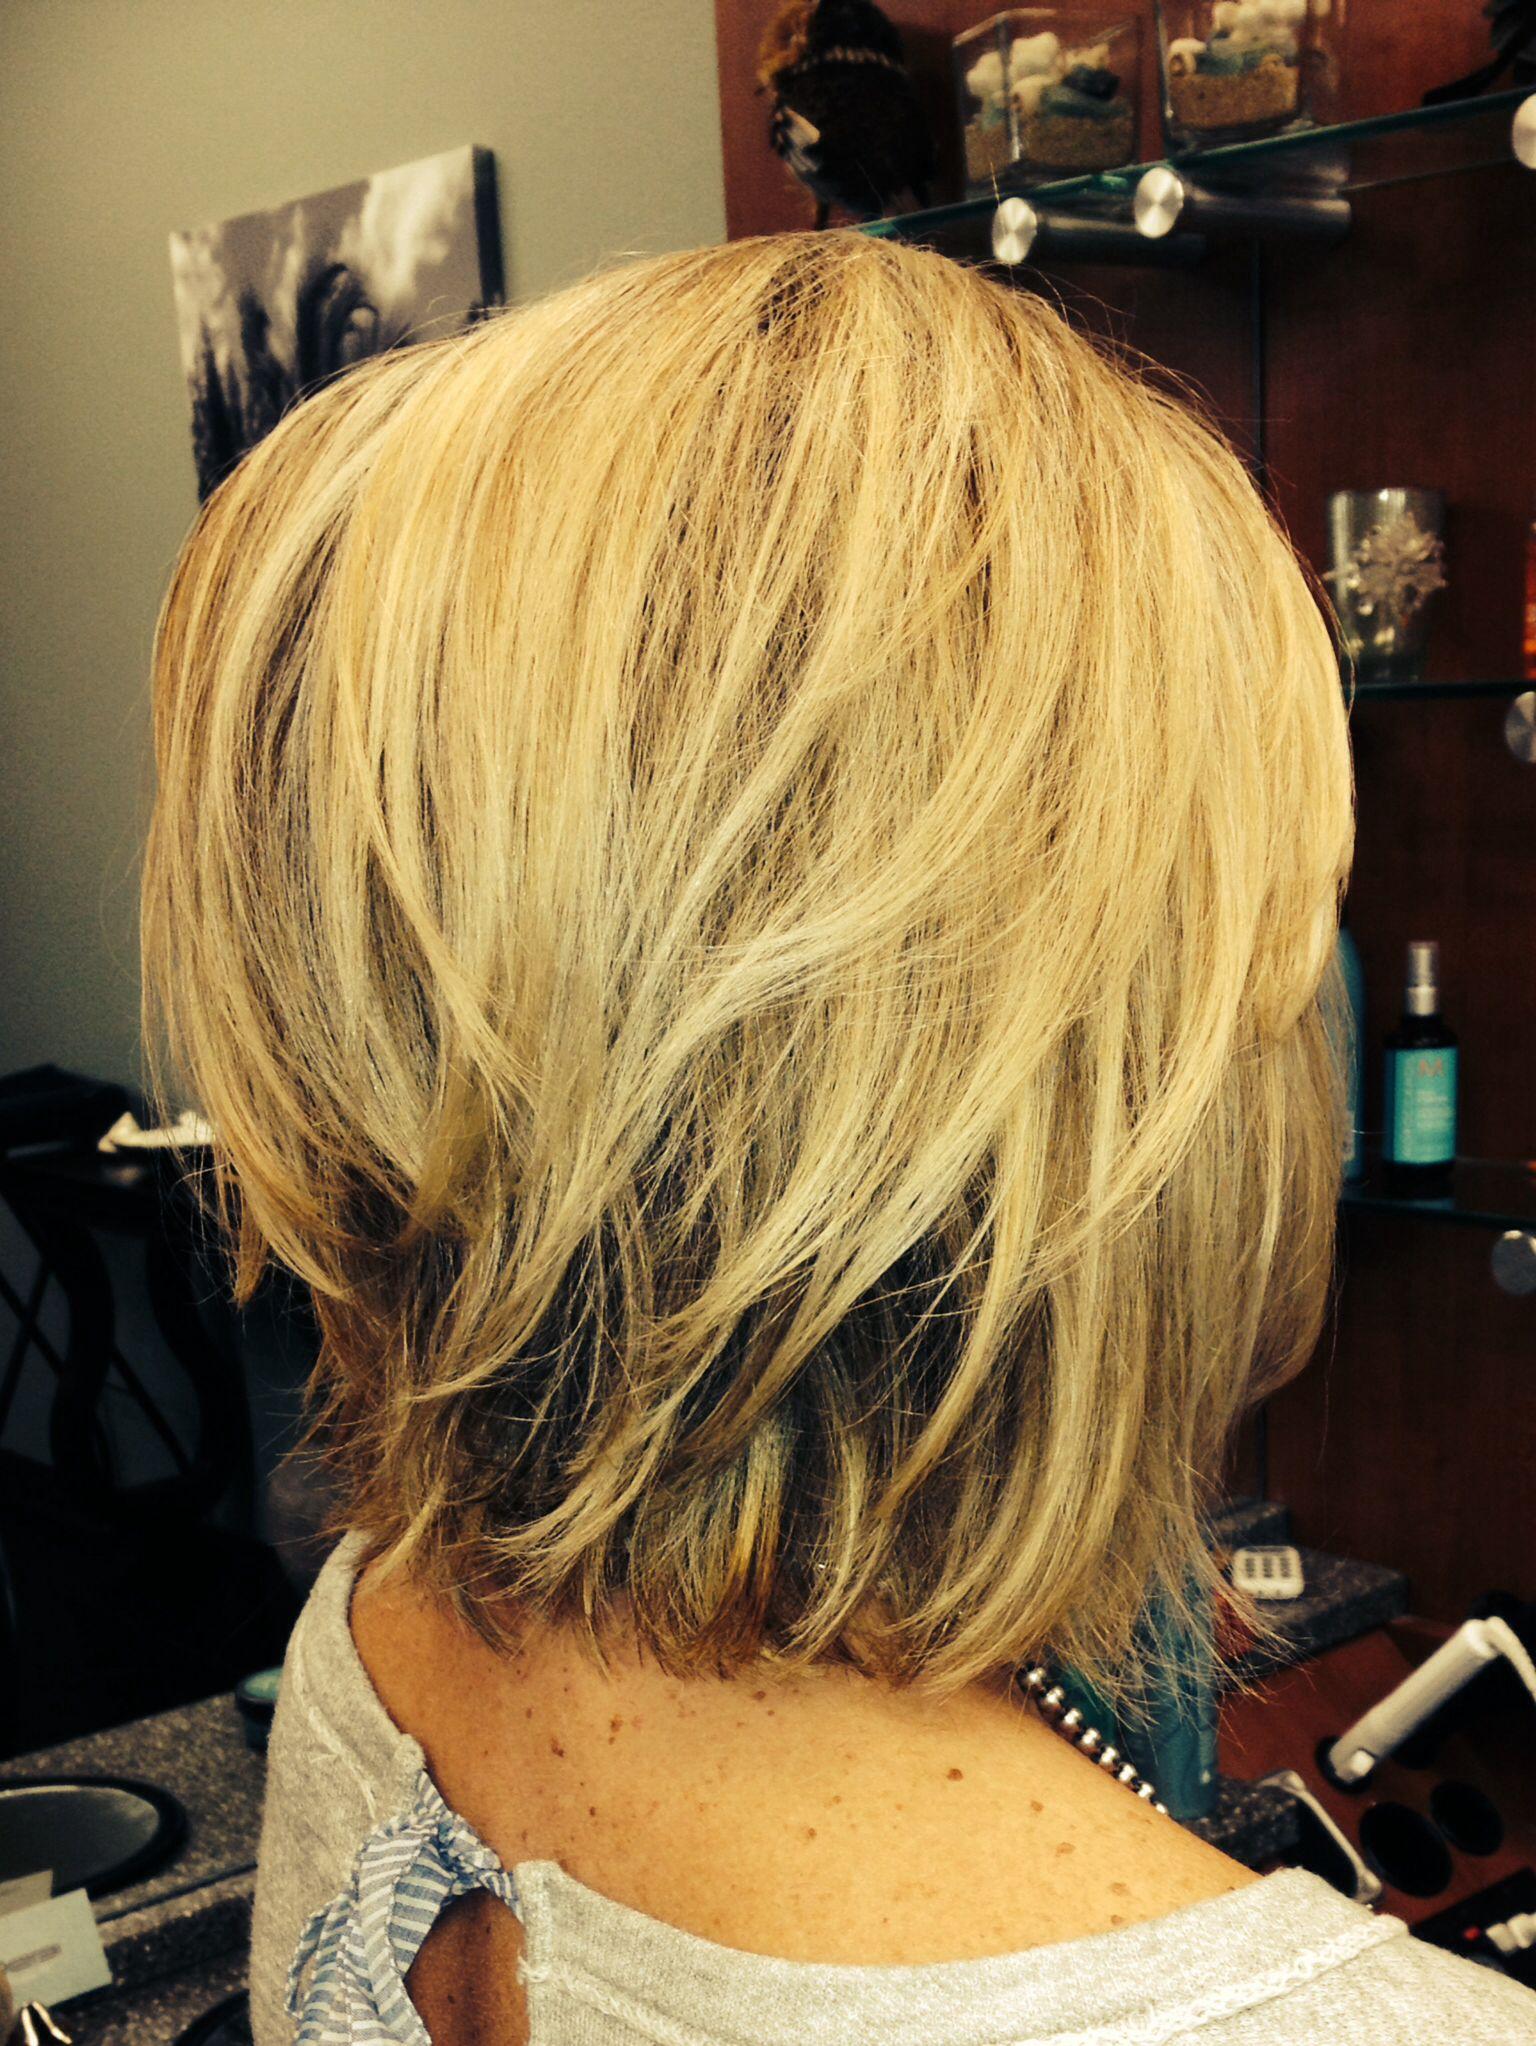 Edgy blonde bob by debi s hair pinterest blonde bobs bobs